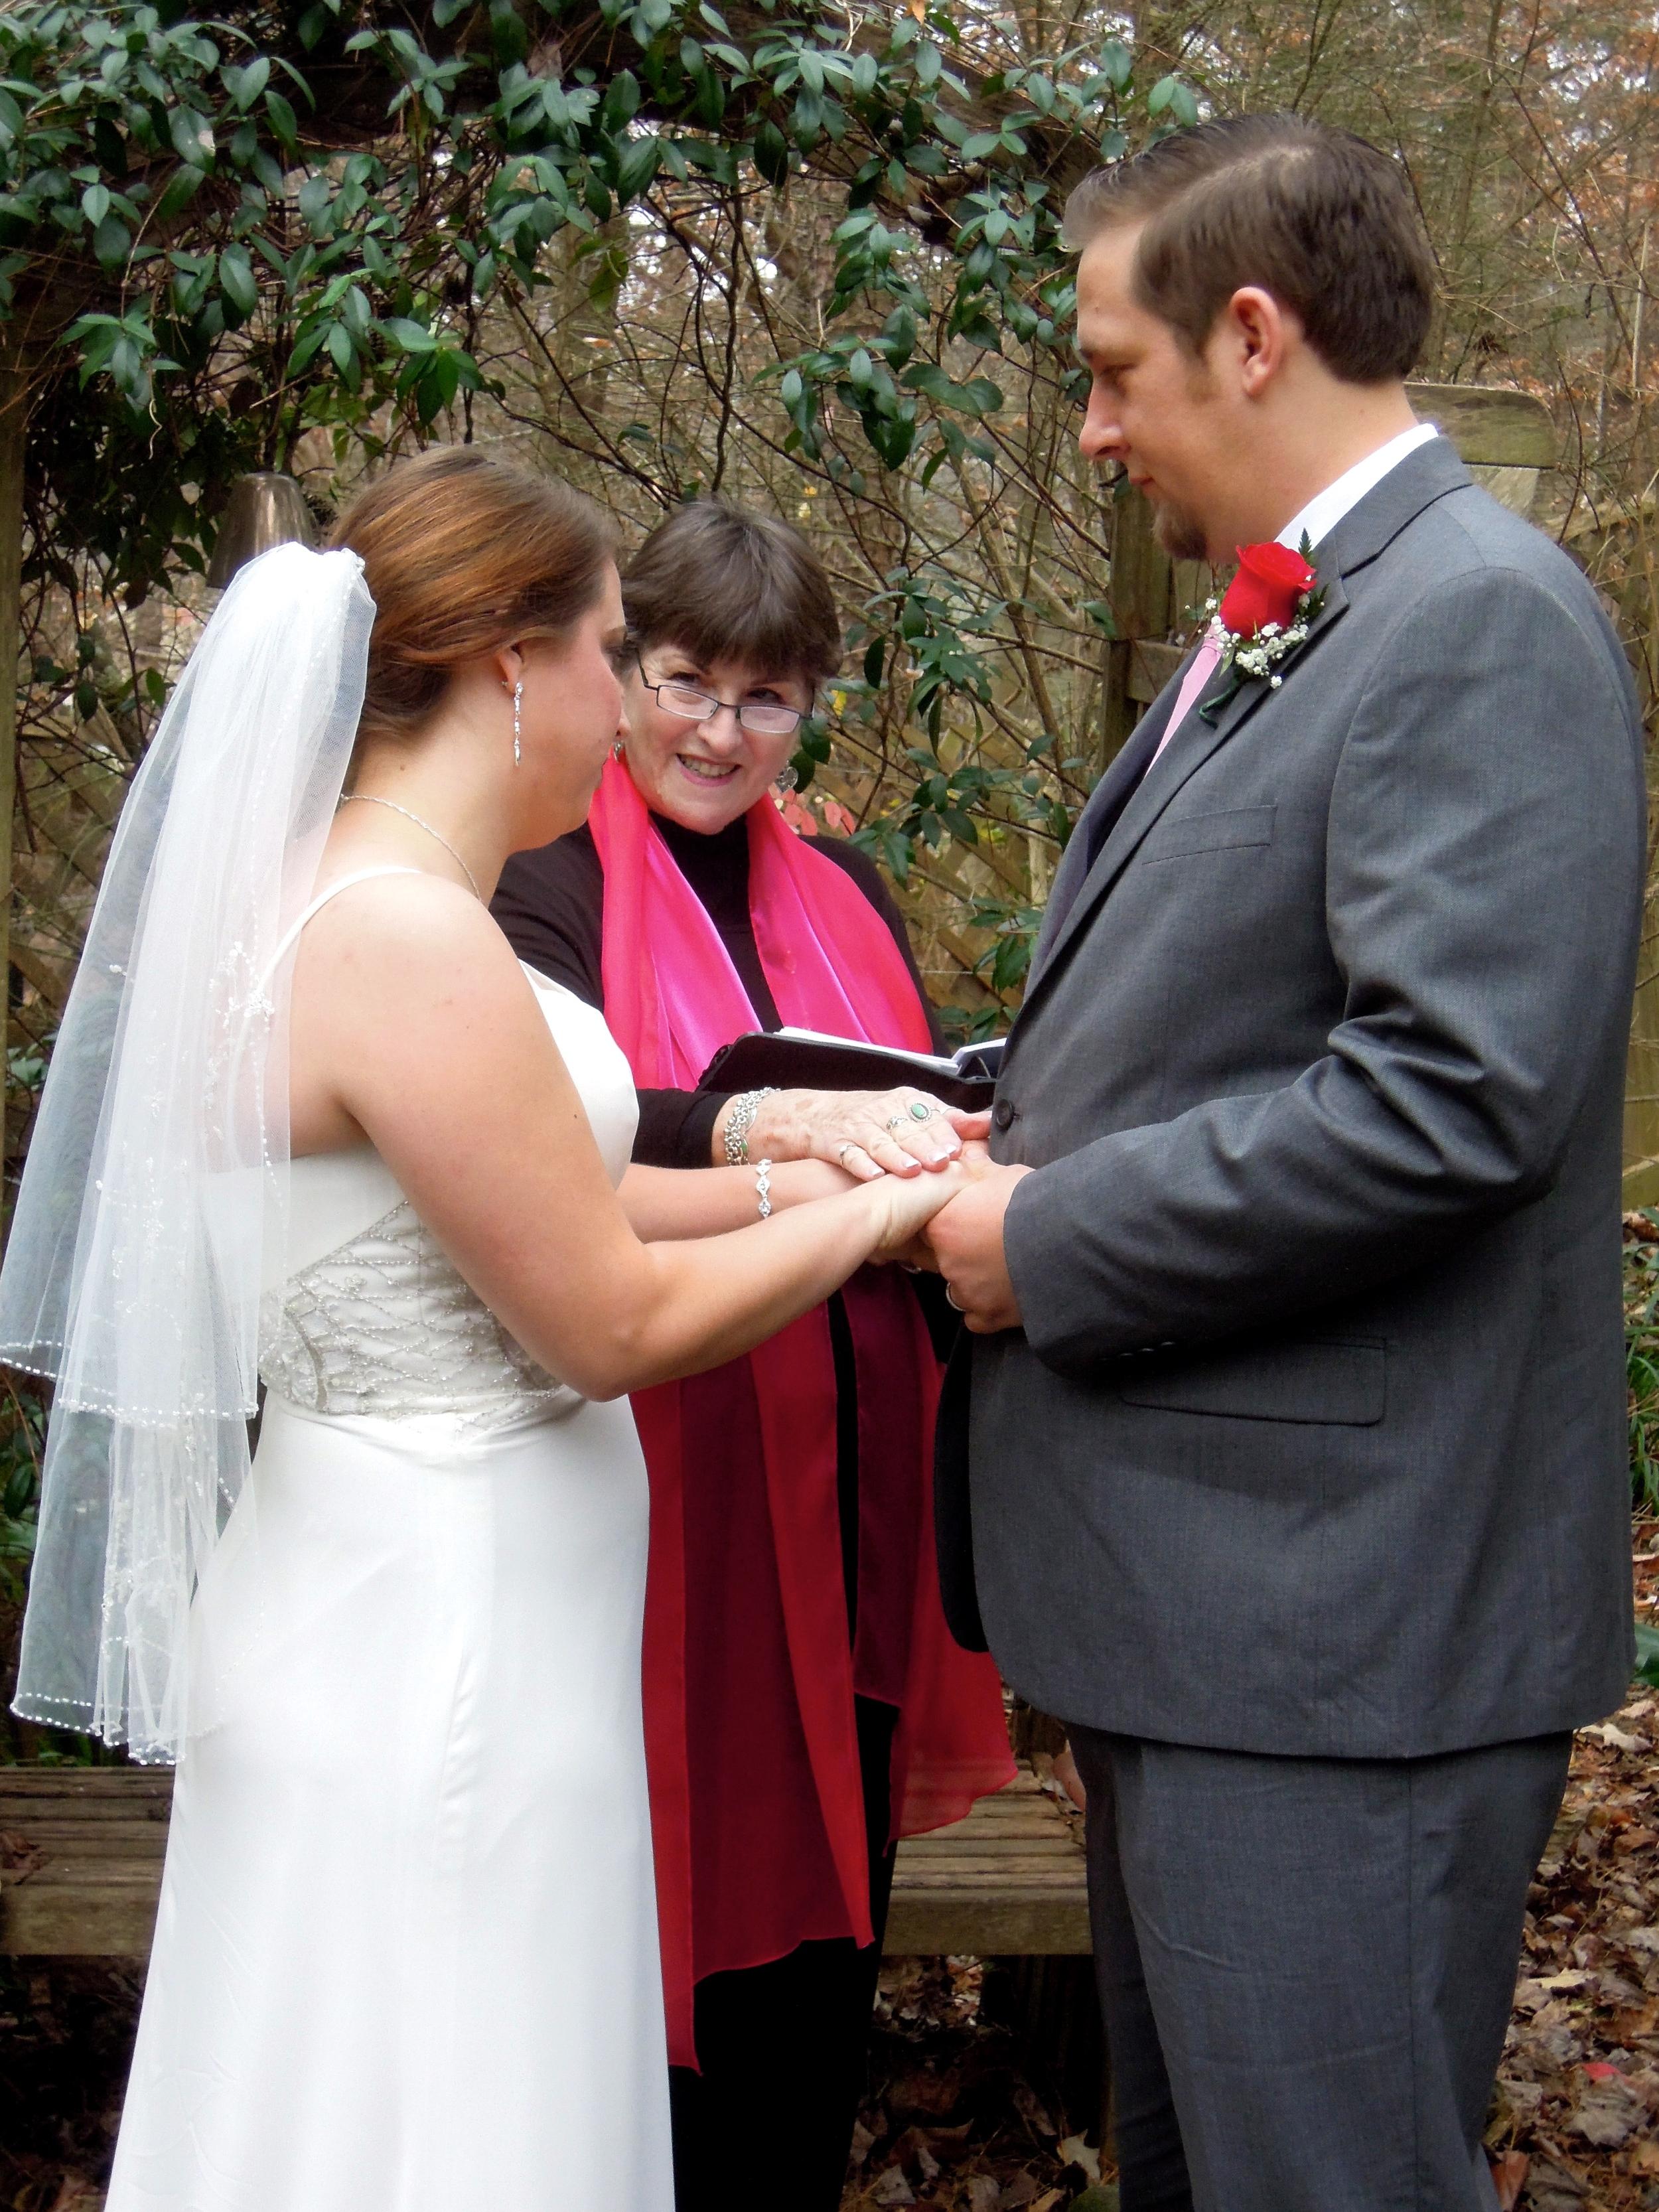 Amanda and Ryan Tie the Knot